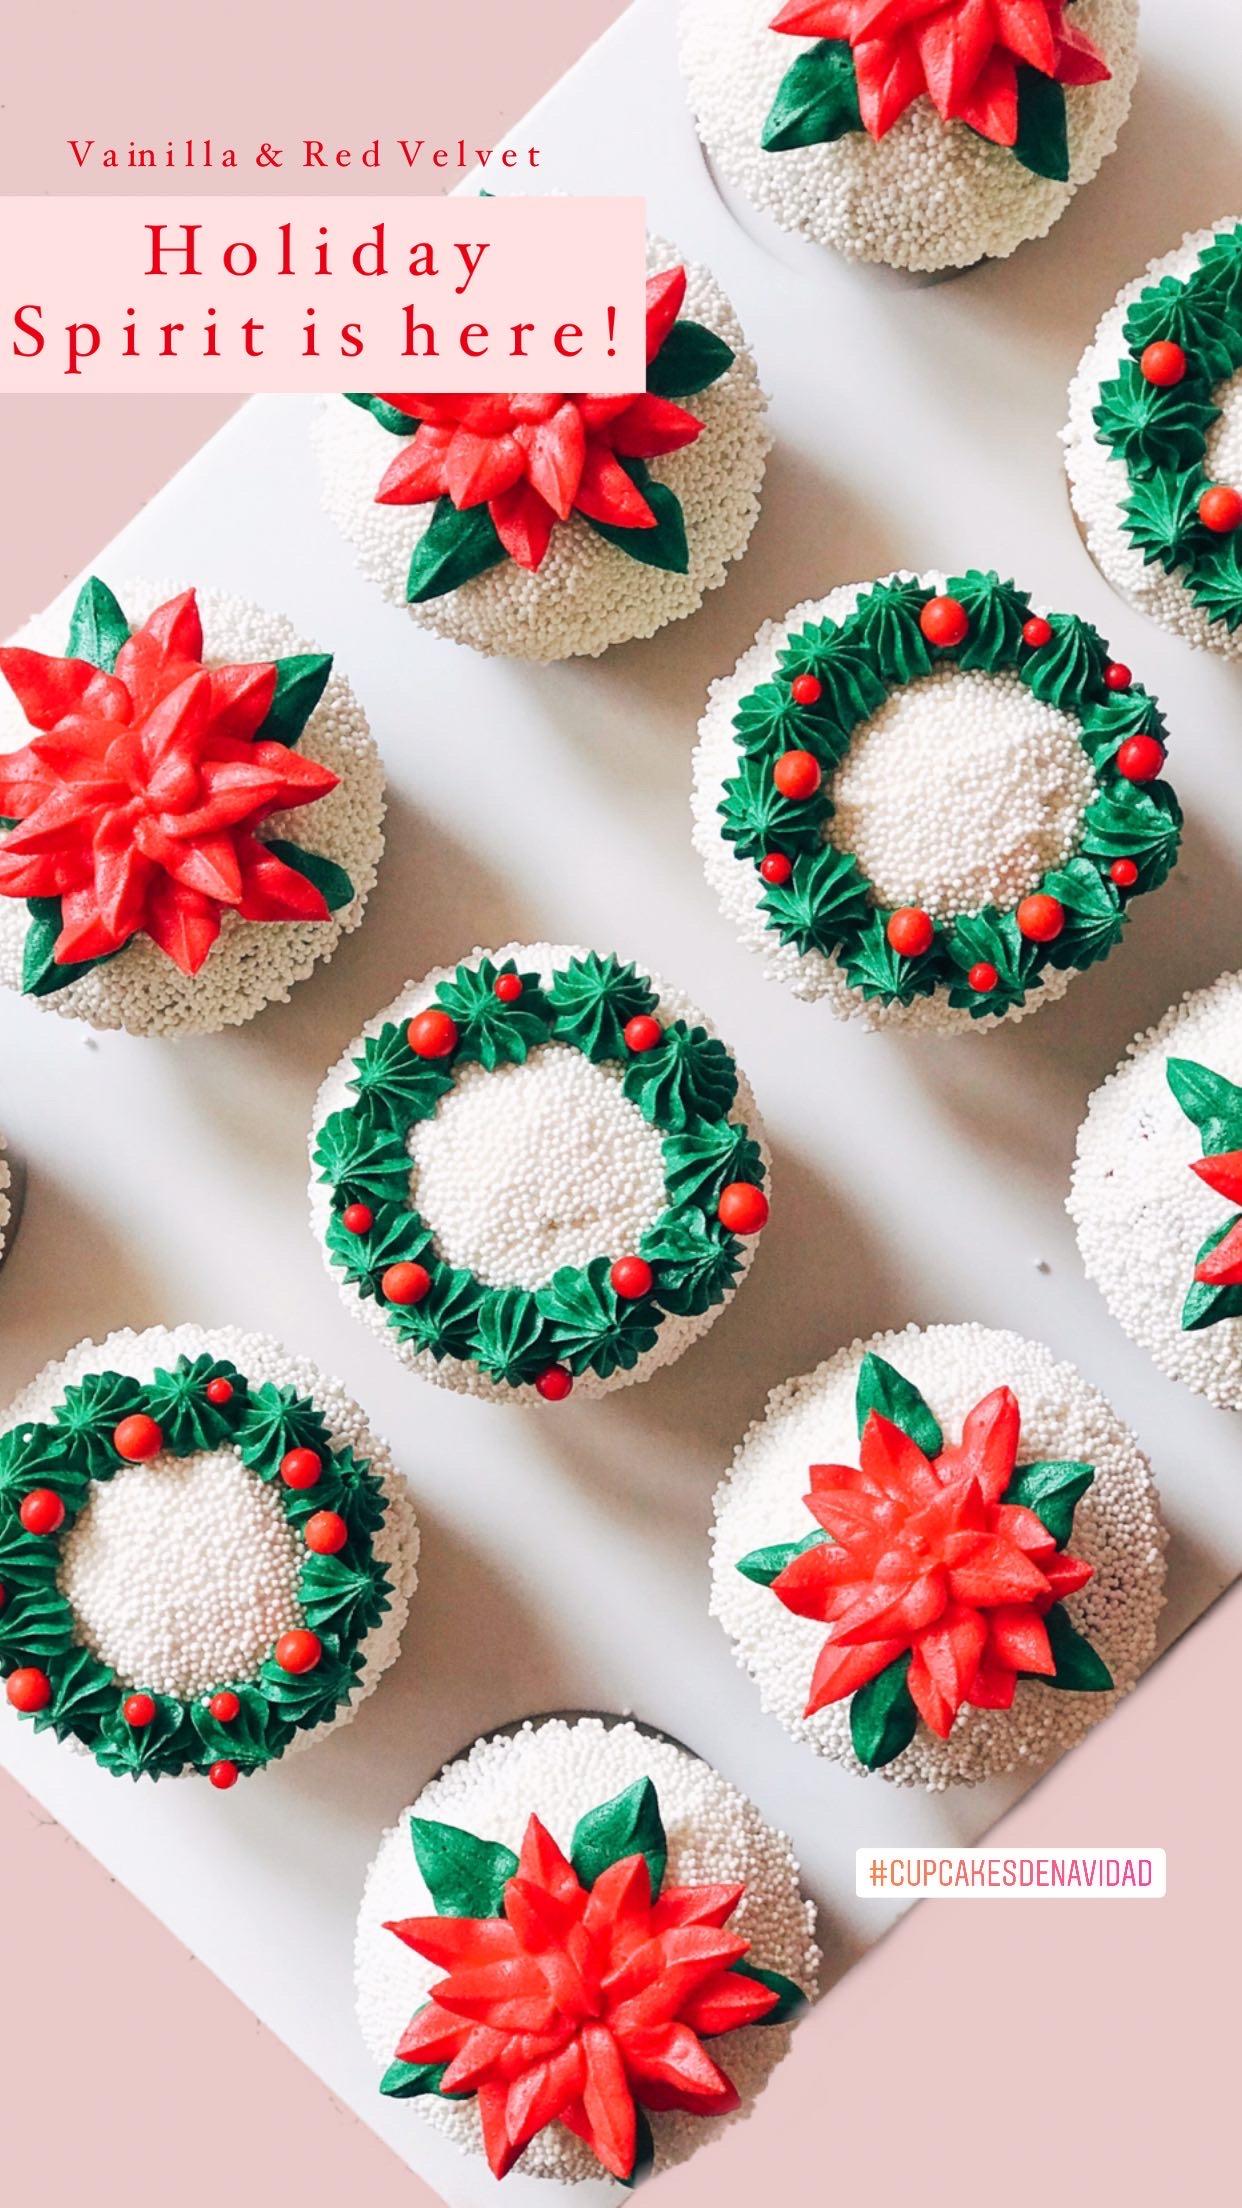 Vainilla & Red Velvet Cupcakes